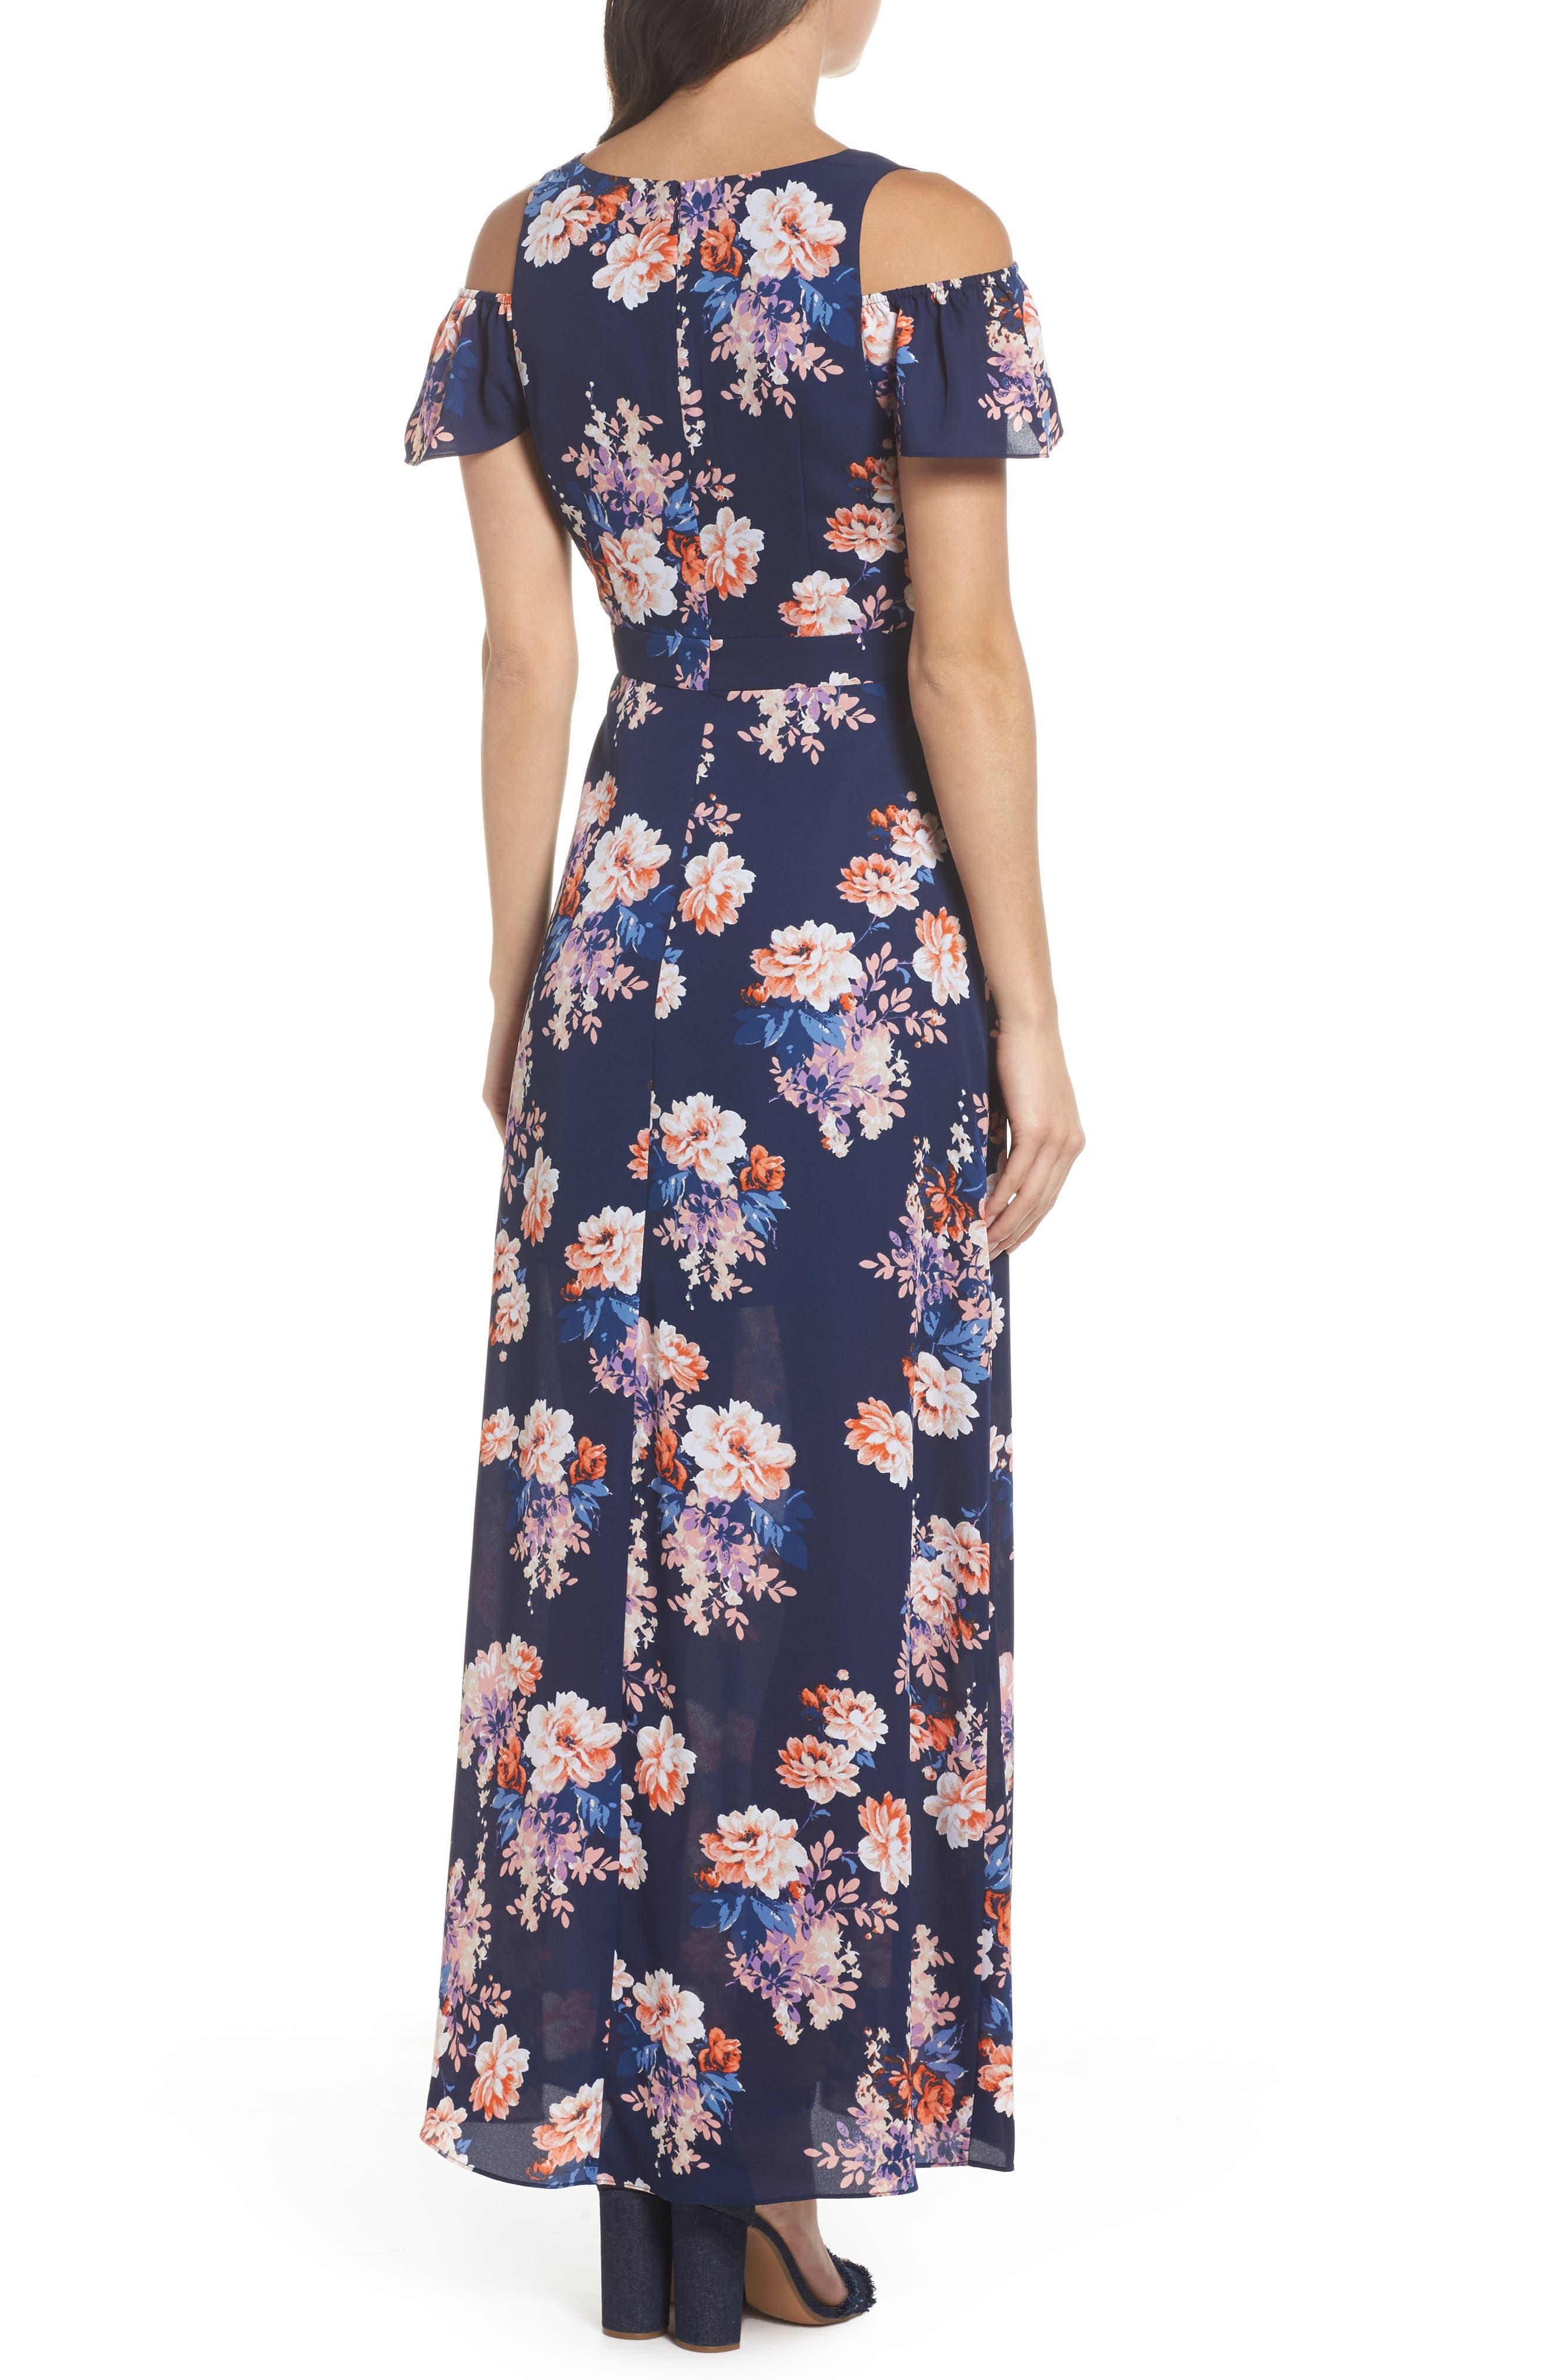 Chasing Butterflies Maxi Dress,                             Alternate thumbnail 2, color,                             400